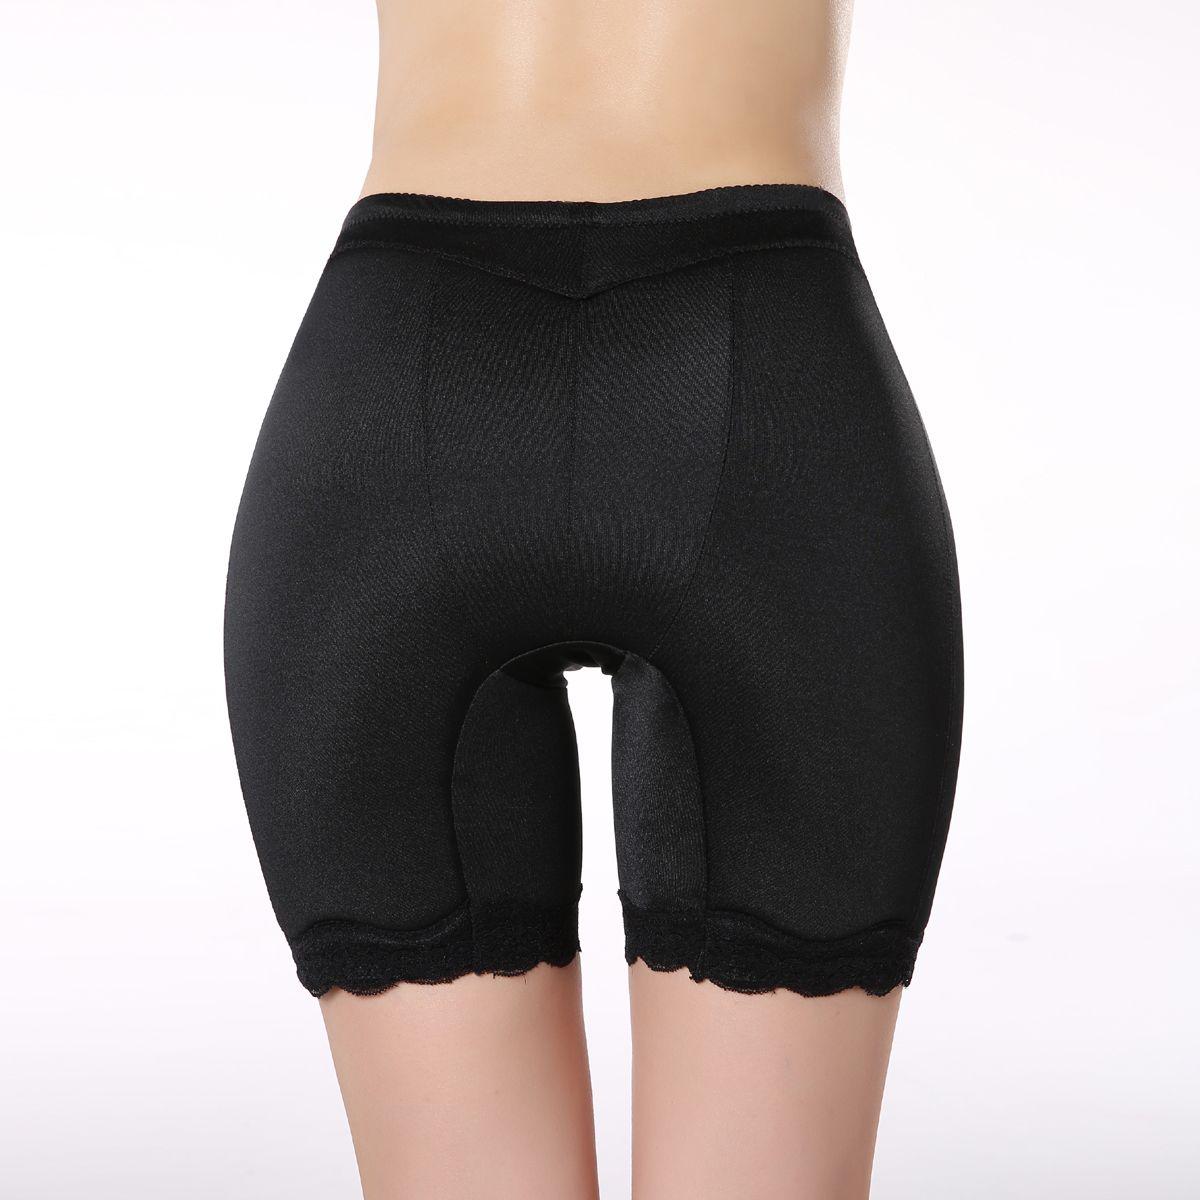 New Ladies Womens Silk Satin French Knickers Lingerie Underwear Panties Briefs | EBay